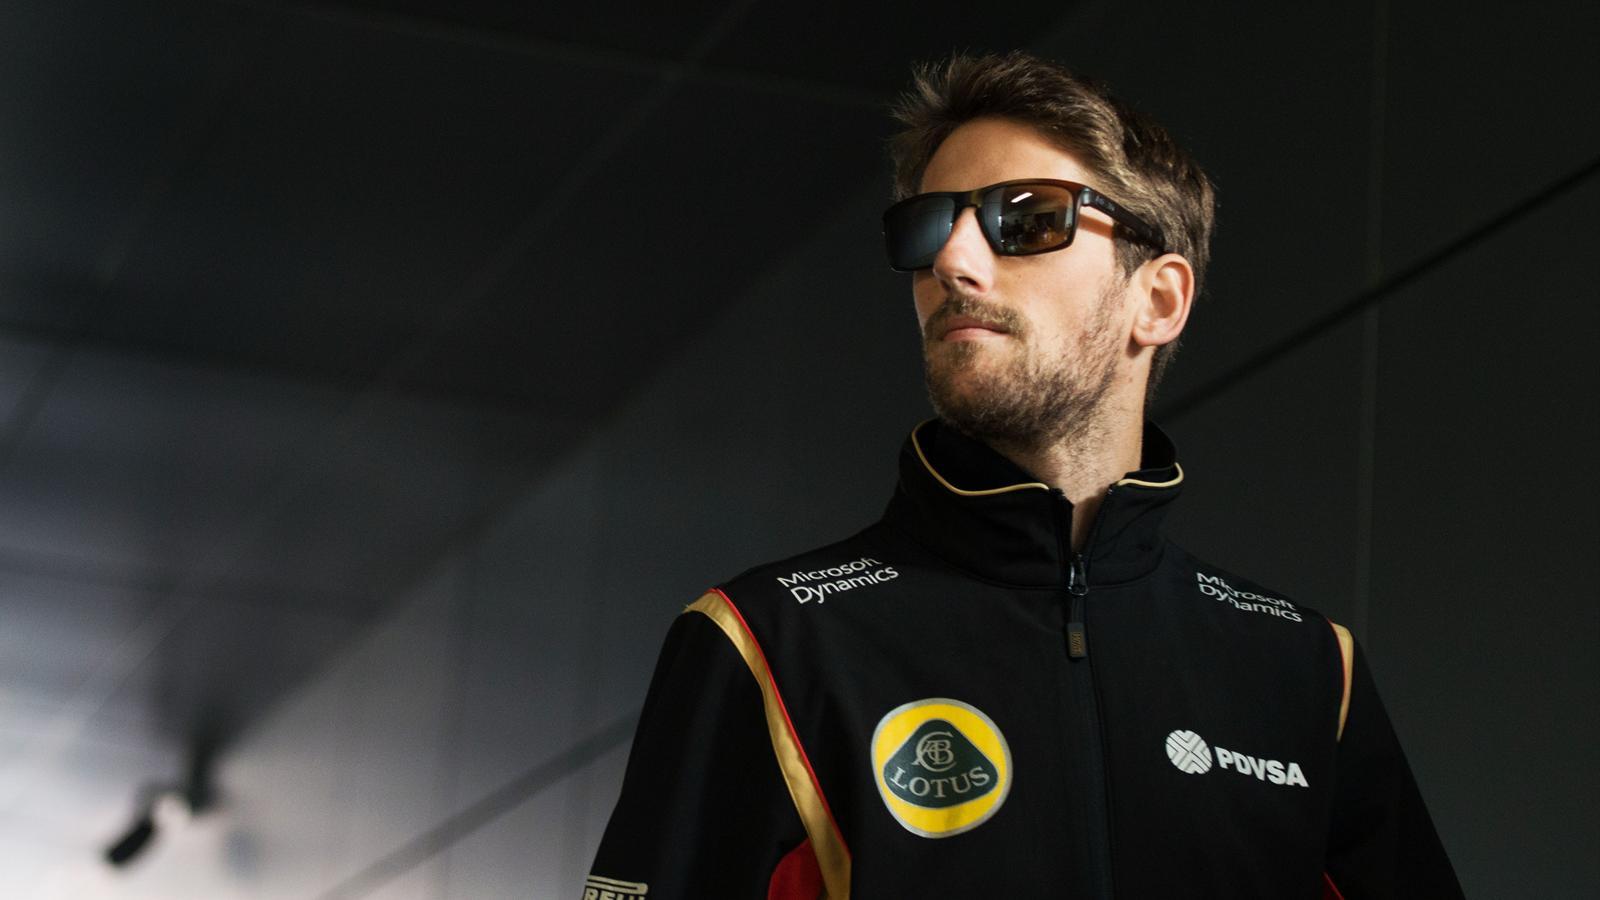 Romain Grosjean (Lotus) au Grand Prix de Russie 2015